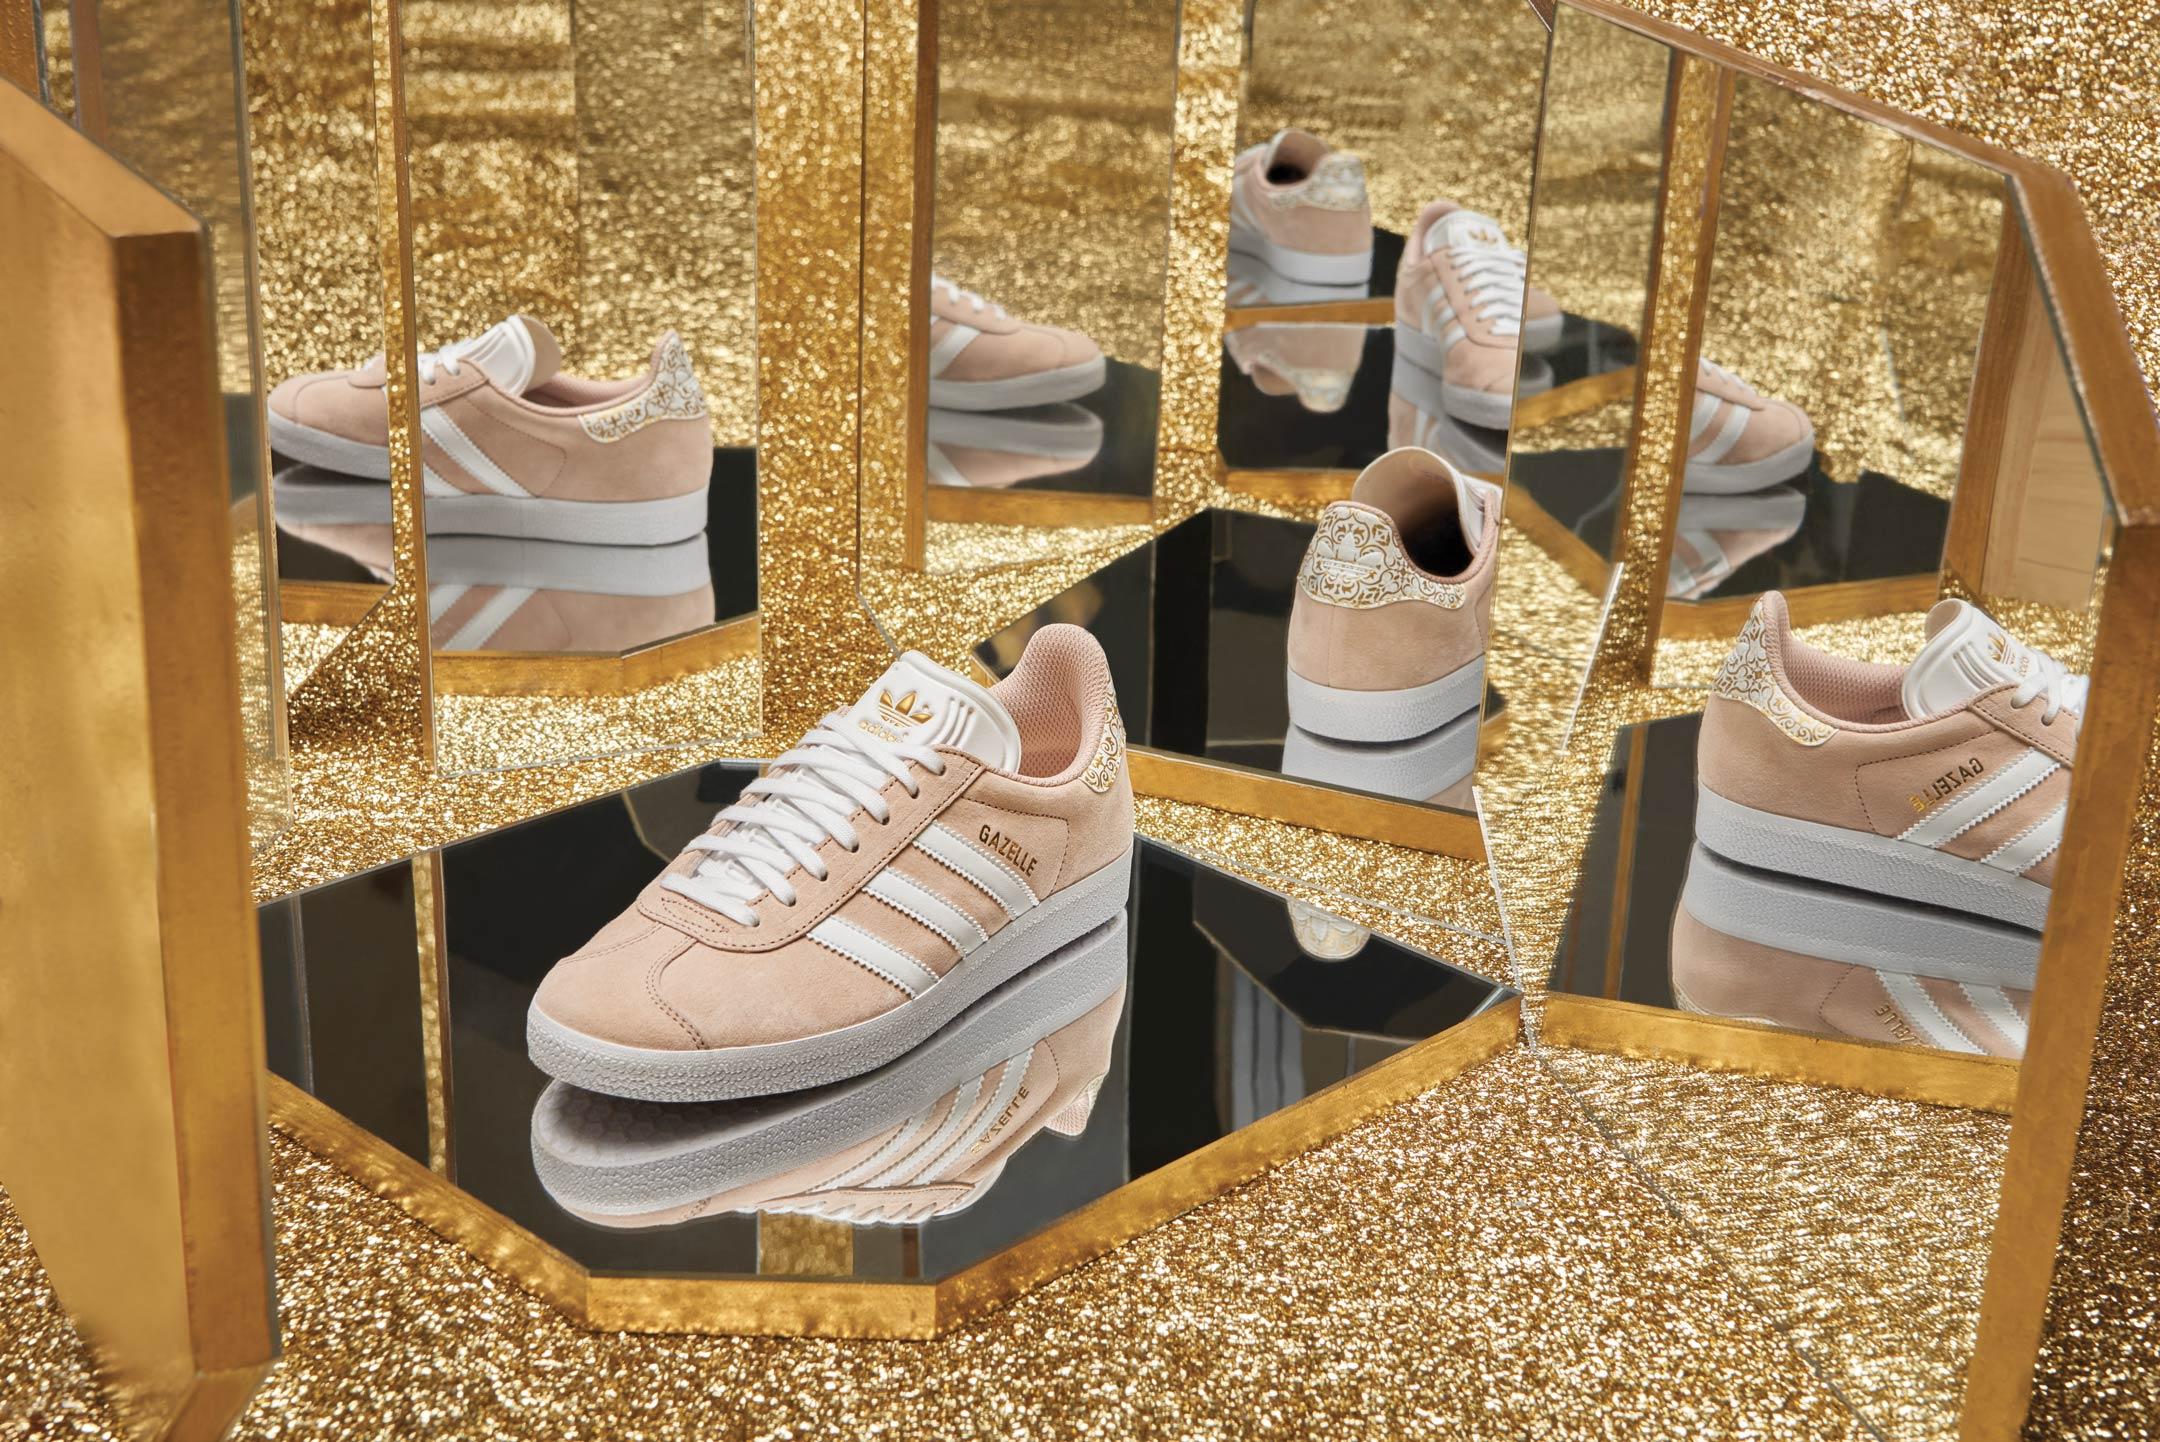 Sneakers Primavera 2018Aw Lab Precious PackBigodino Lancia The XiuPkOZ